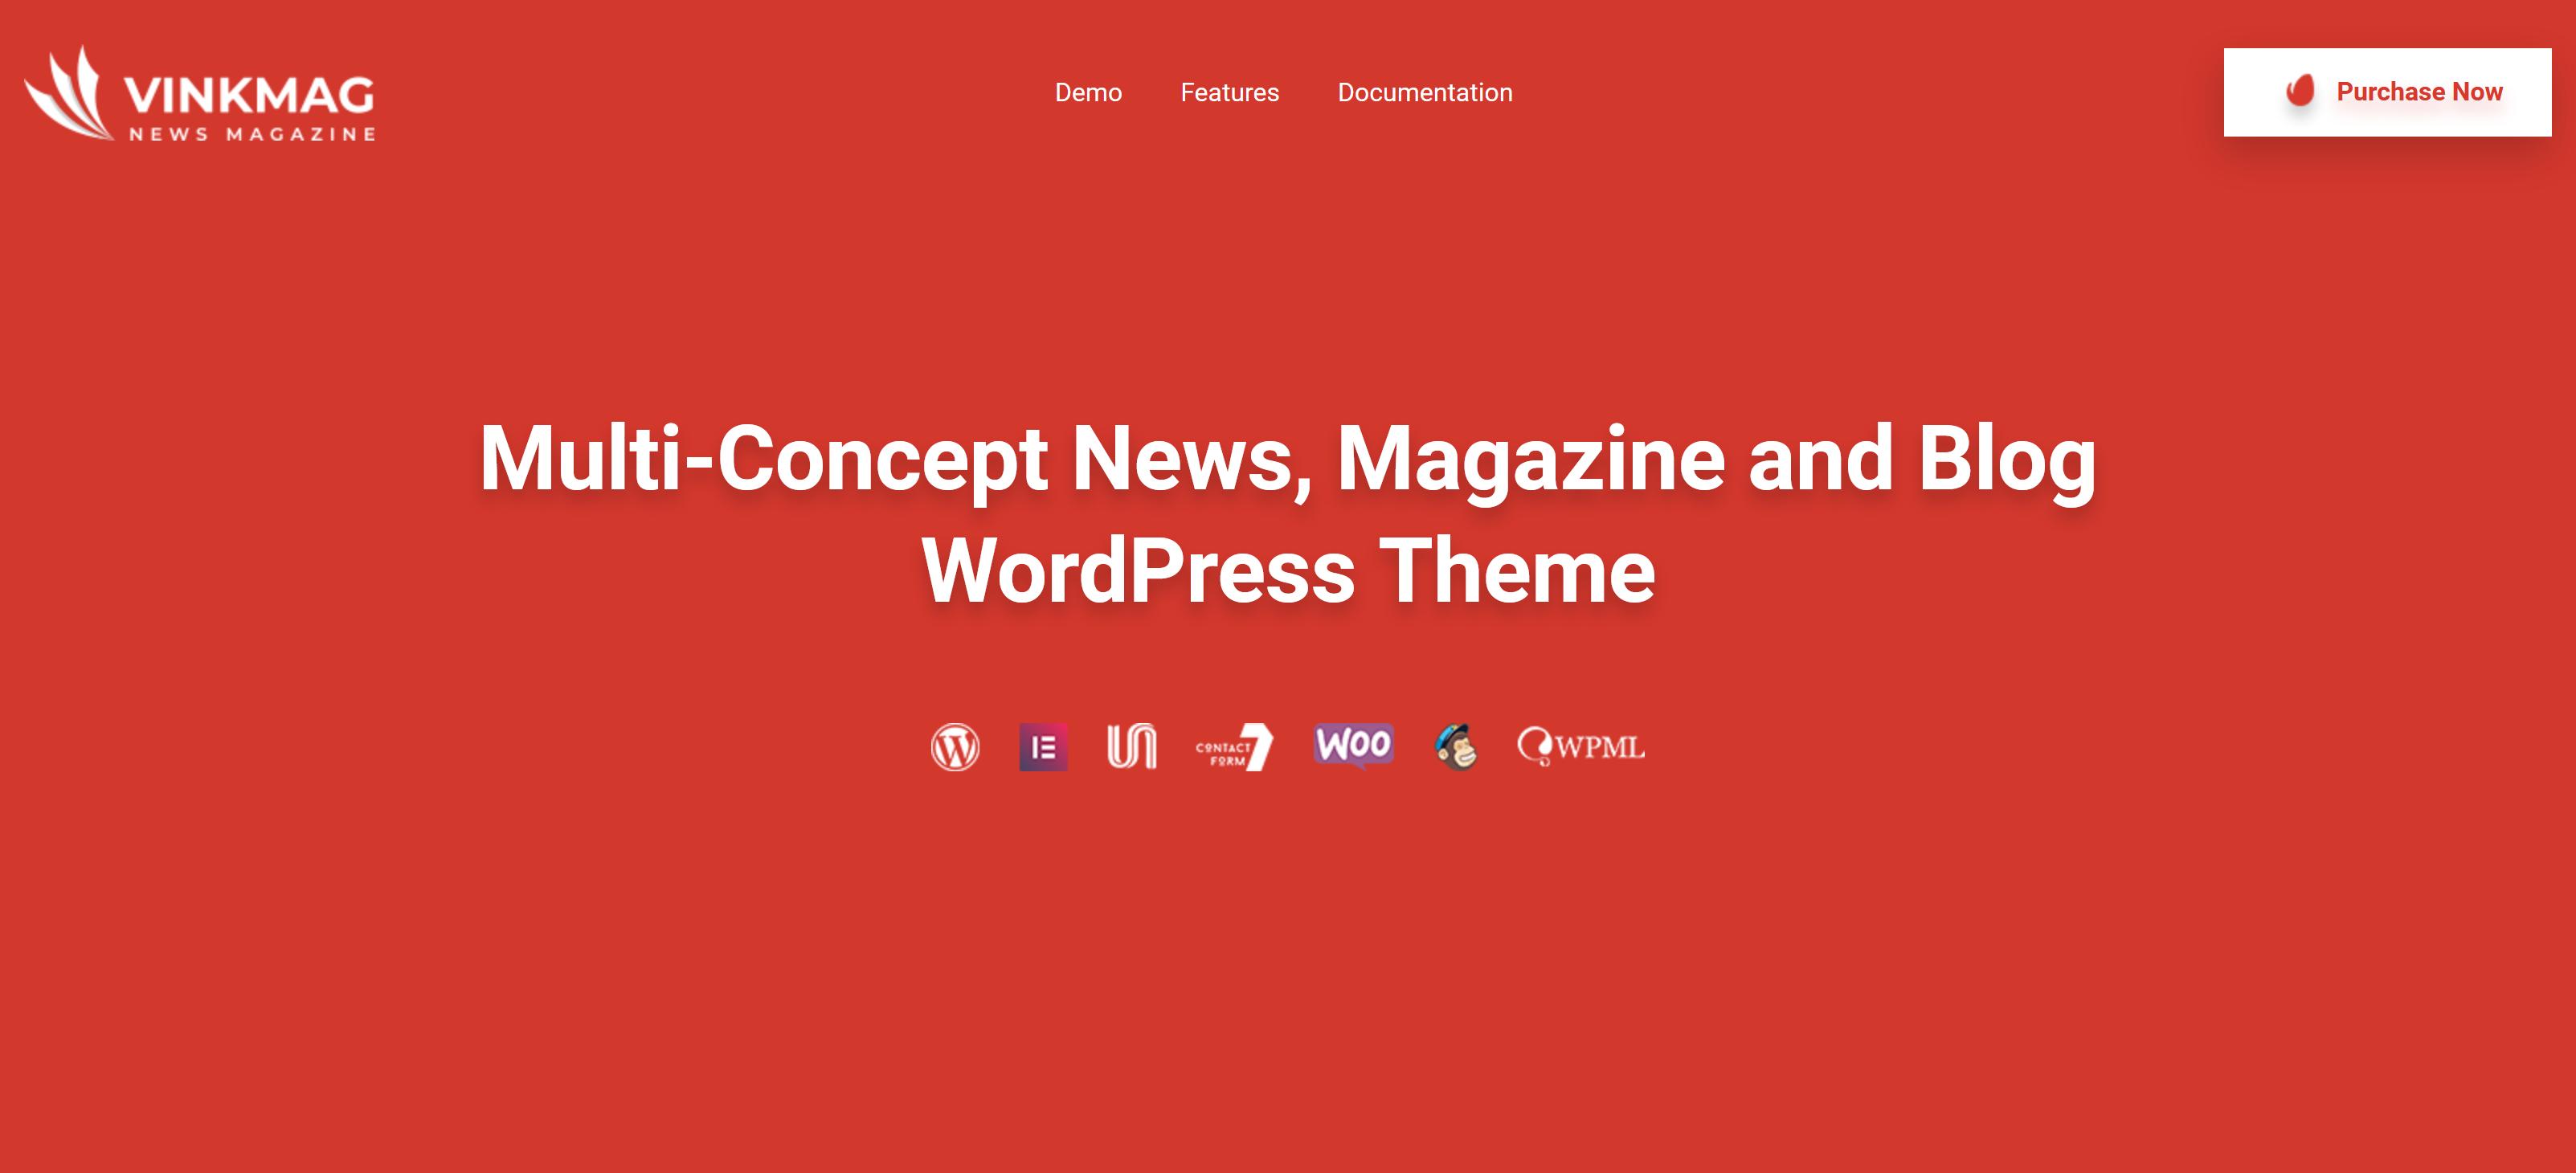 Vinkmag 3.1 – Multi-Concept News, Magazine and Blog WordPress Theme